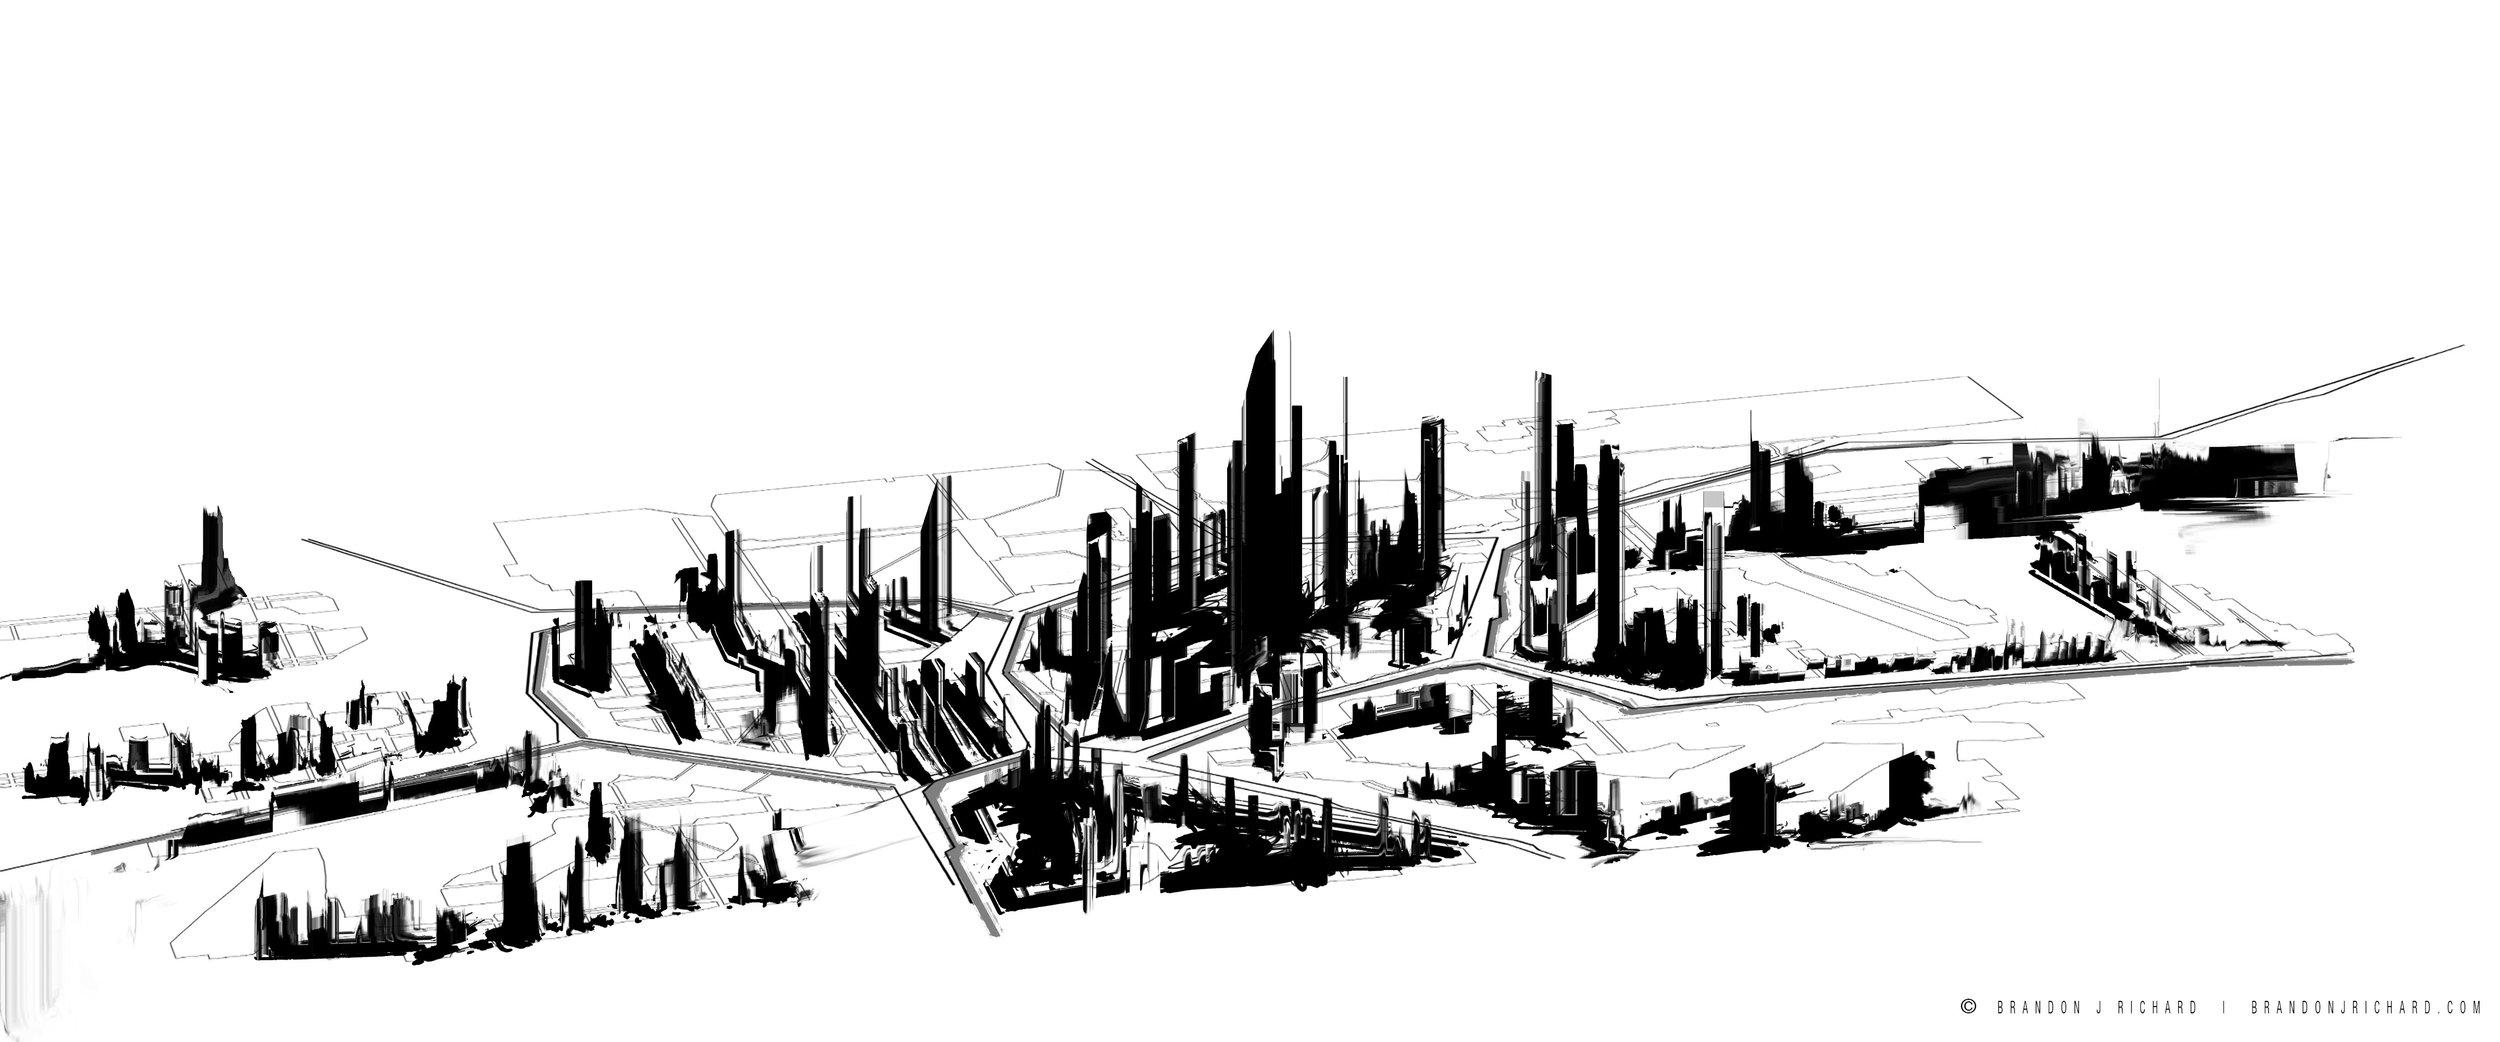 Sketch 003_aerial view concept.jpg